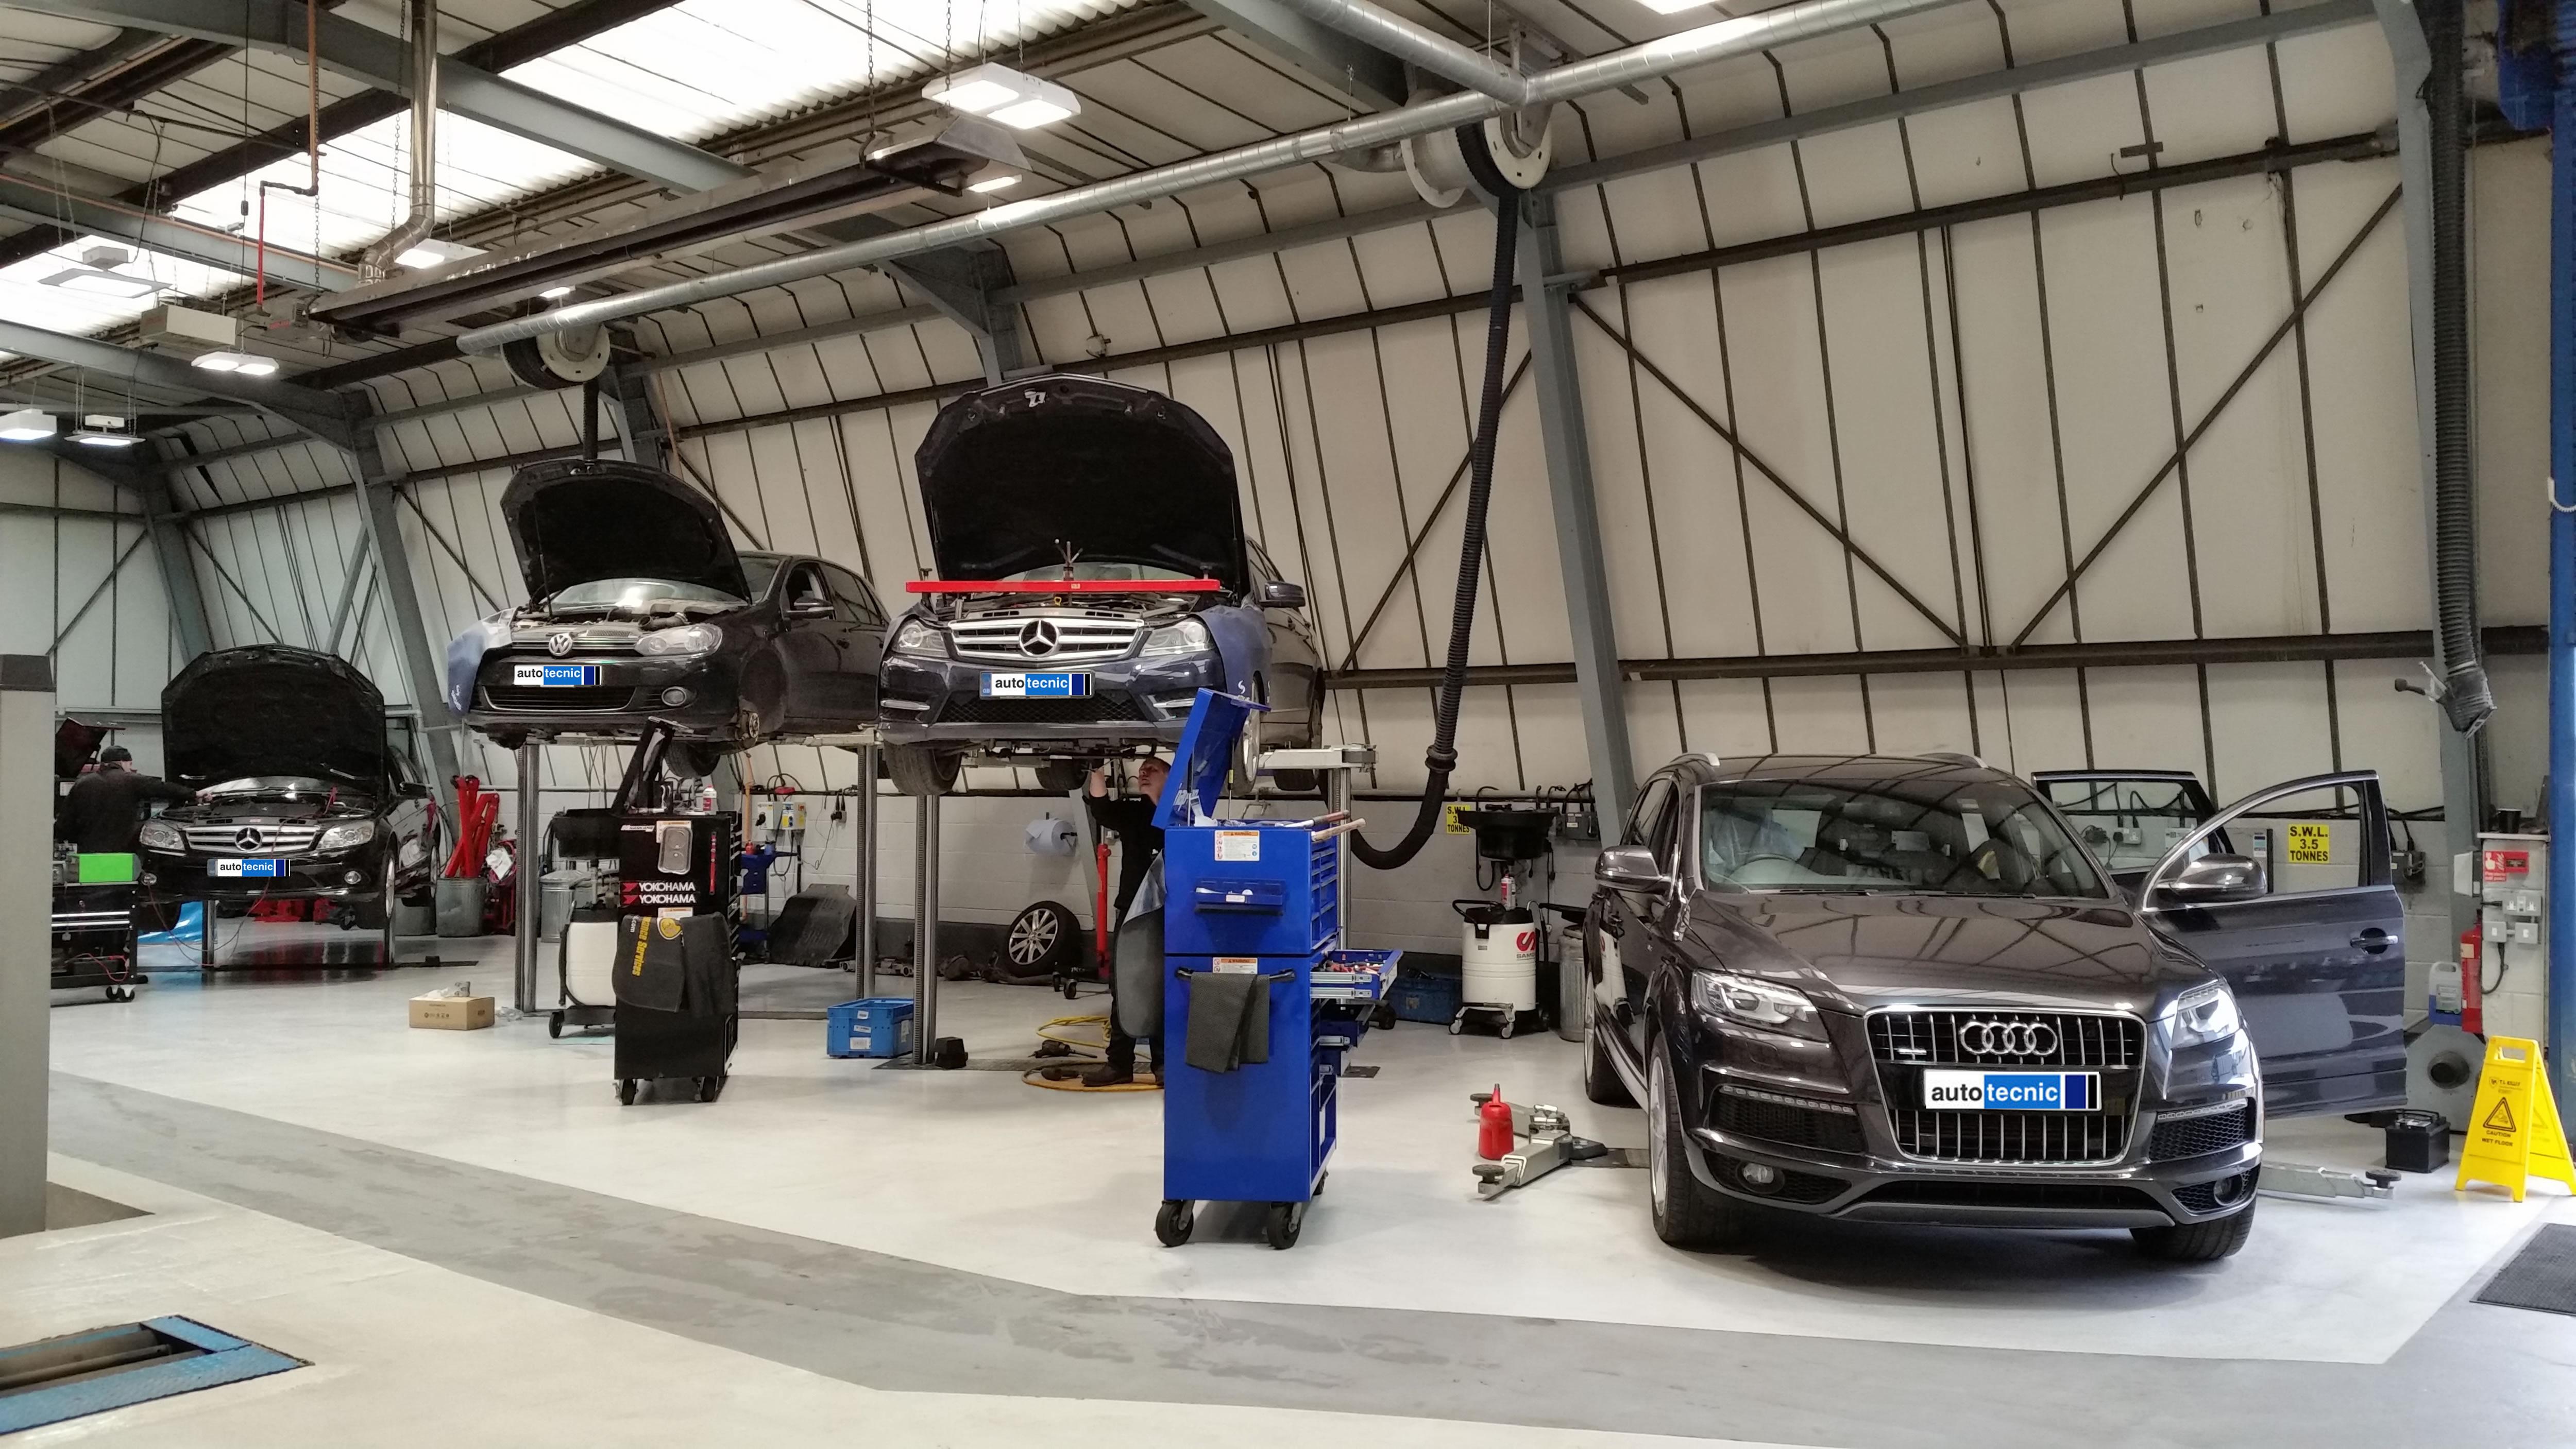 autotecnic - workshop - Mercedes - VW - Audi